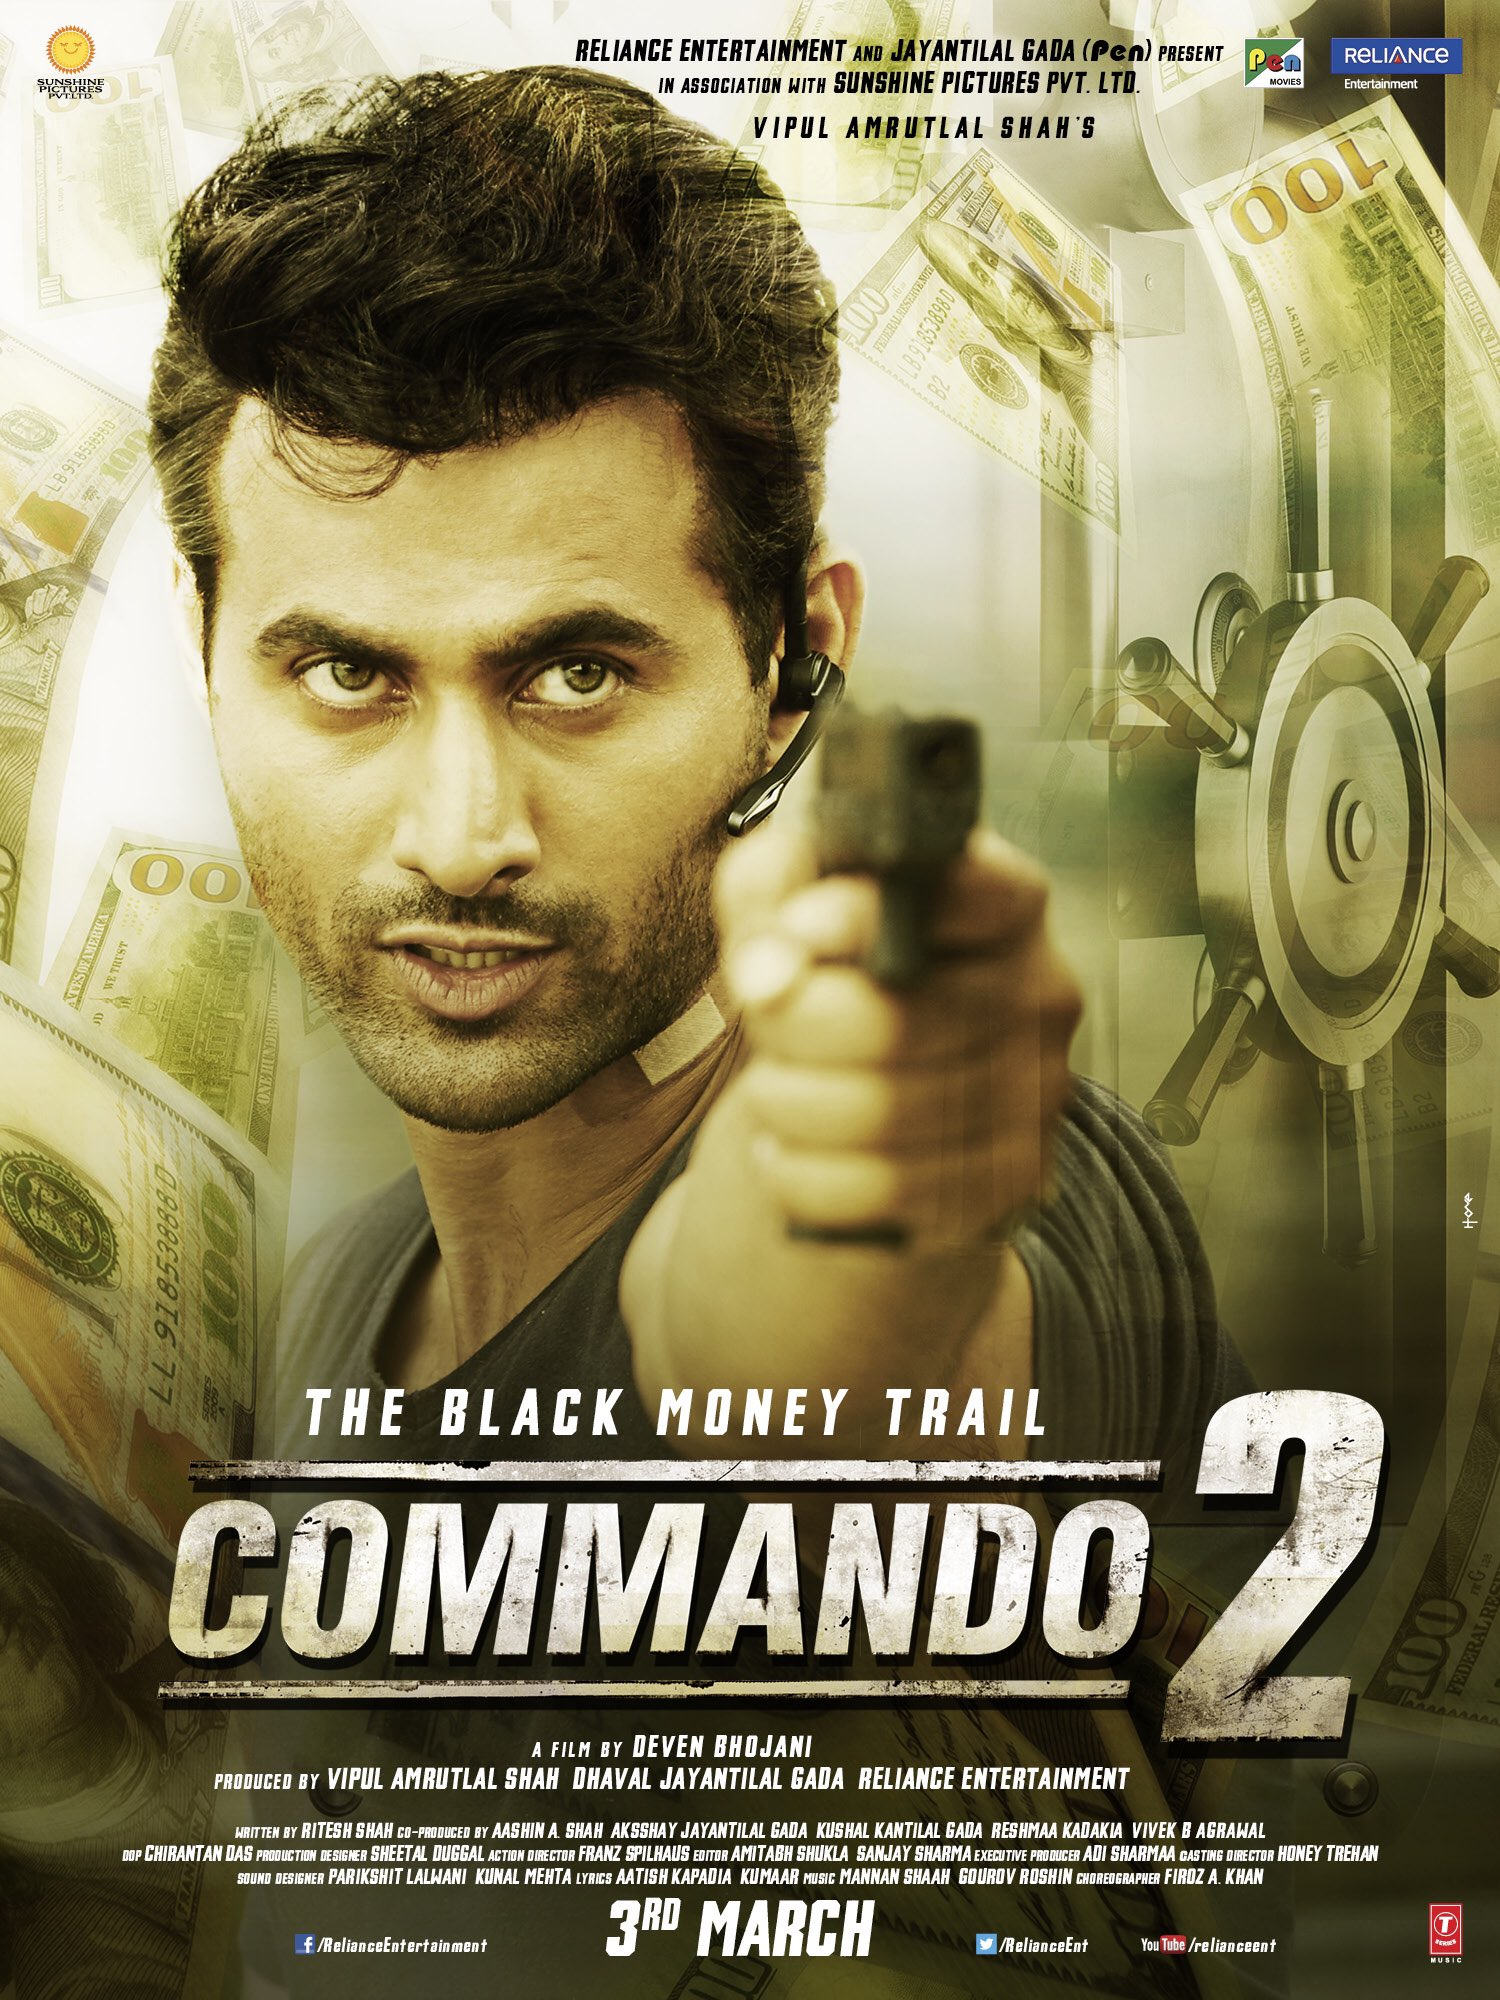 download commando film songs